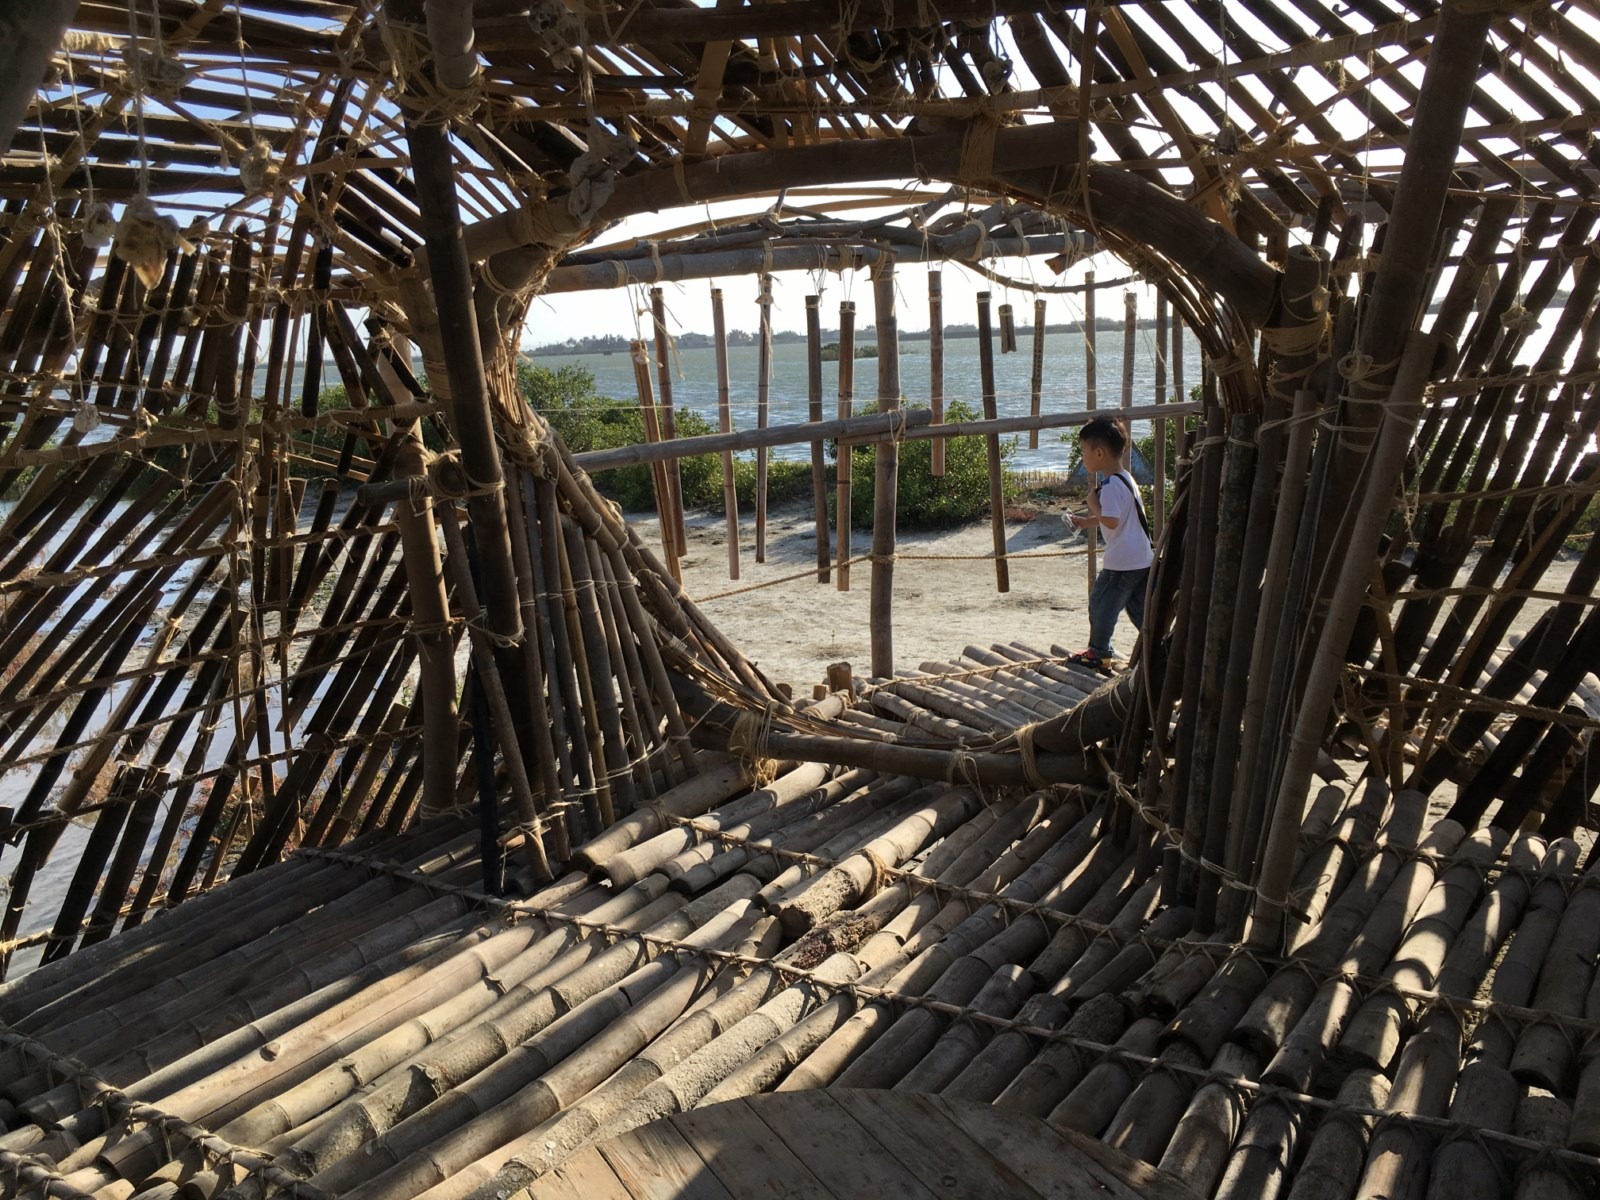 Chenglong shelter 12 [1600x1200]